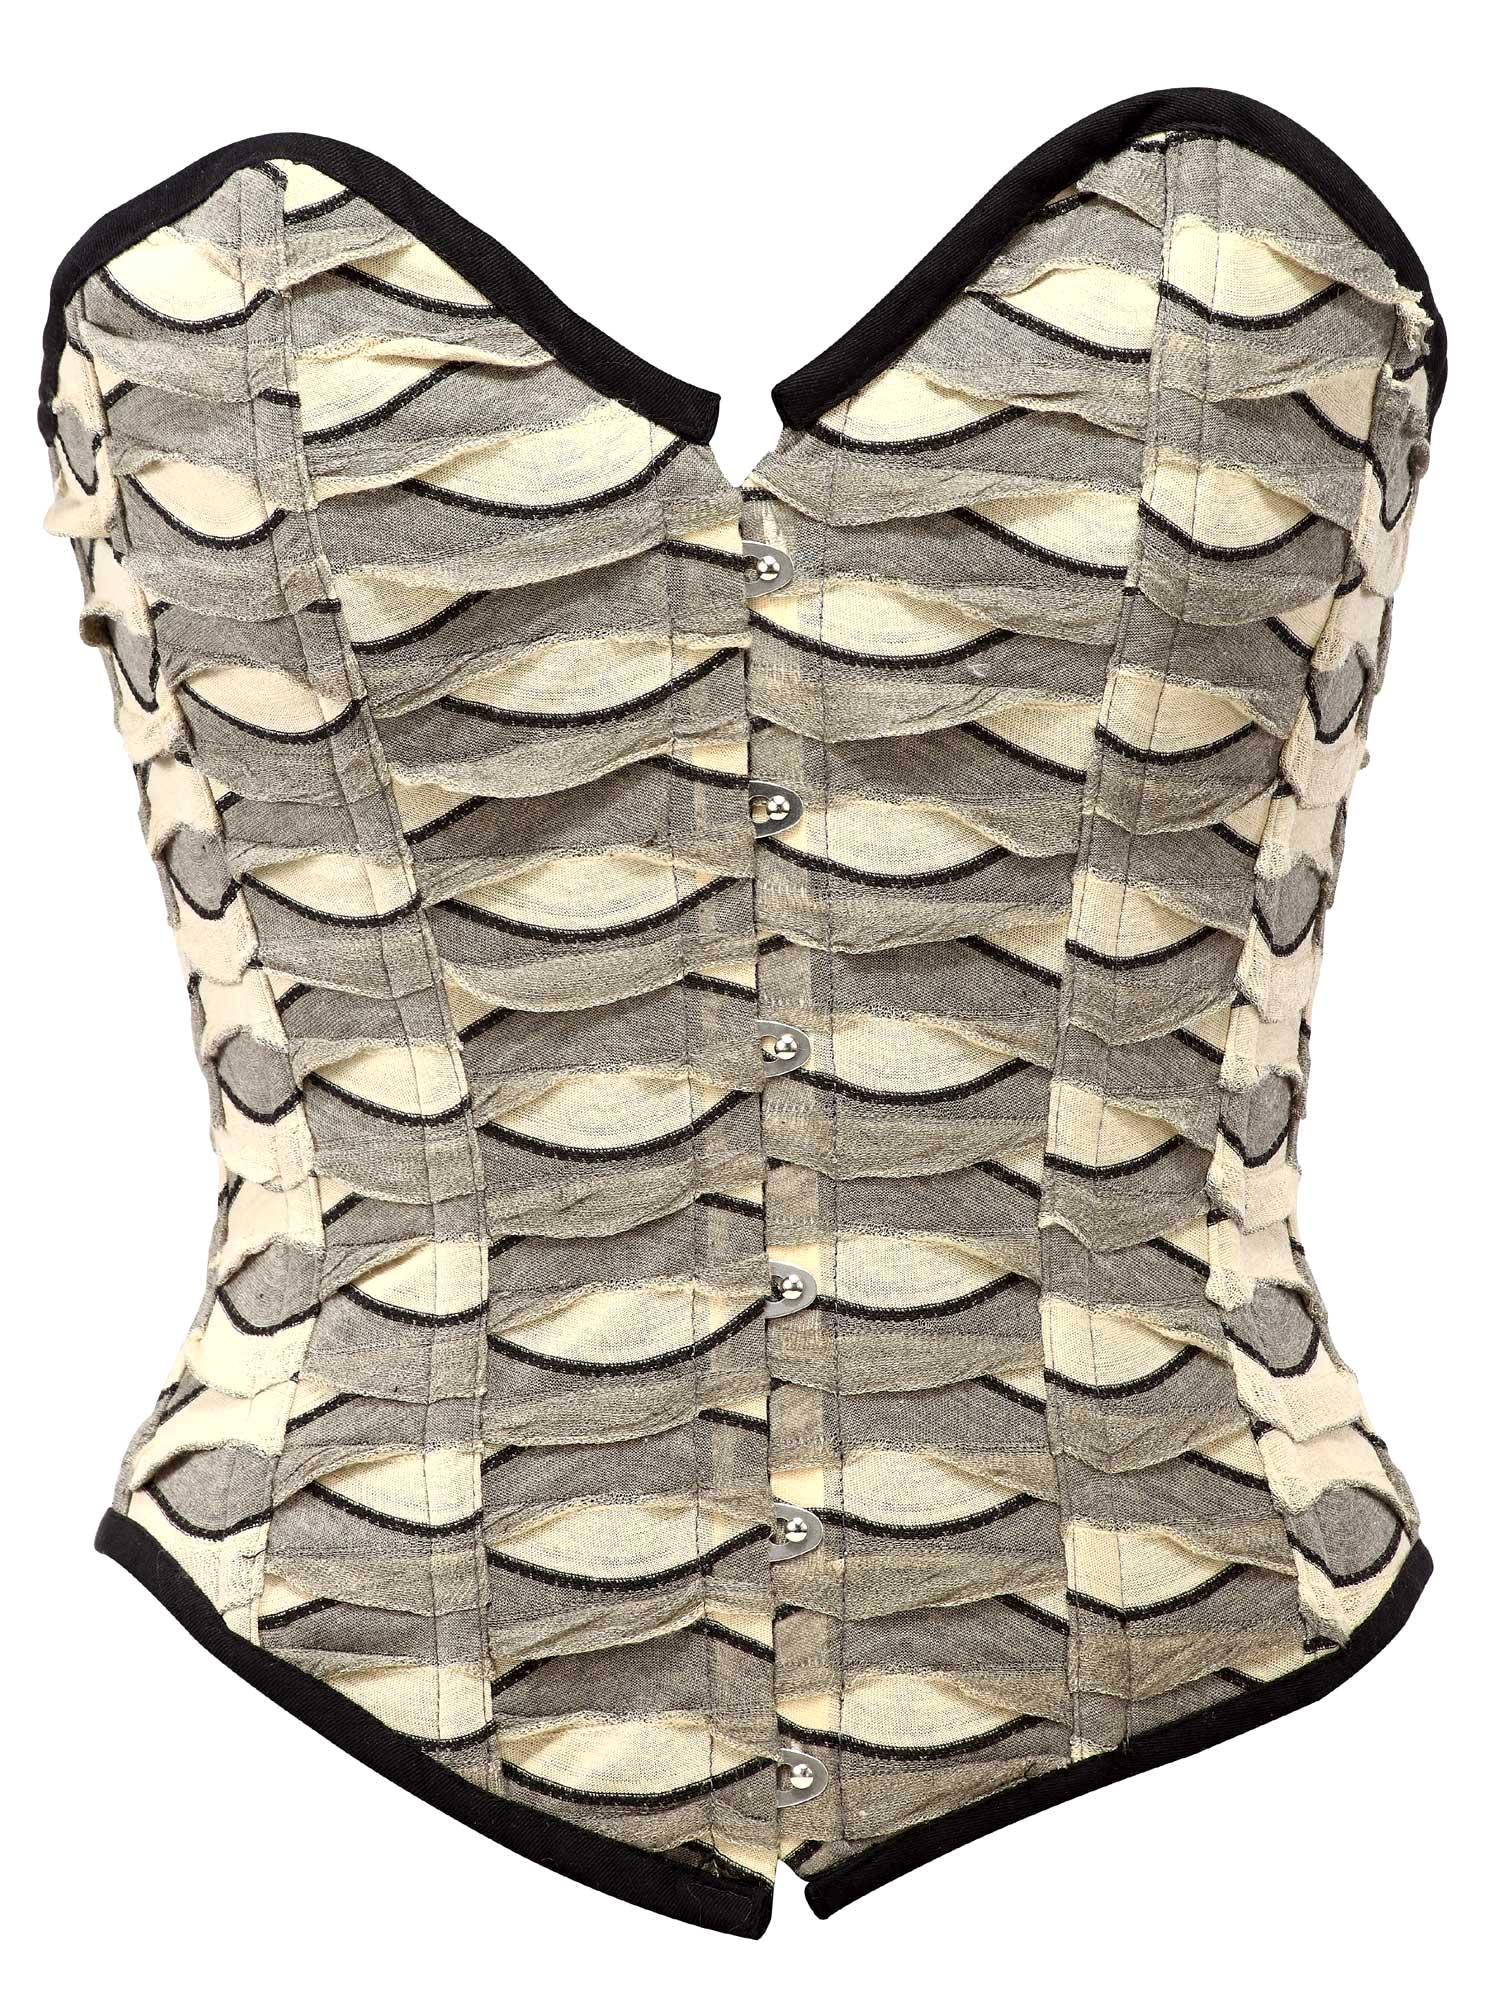 shredded_fabric_cutwork_steel_boning_corset_waist_cincher_bustier_bustiers_and_corsets_5.jpg